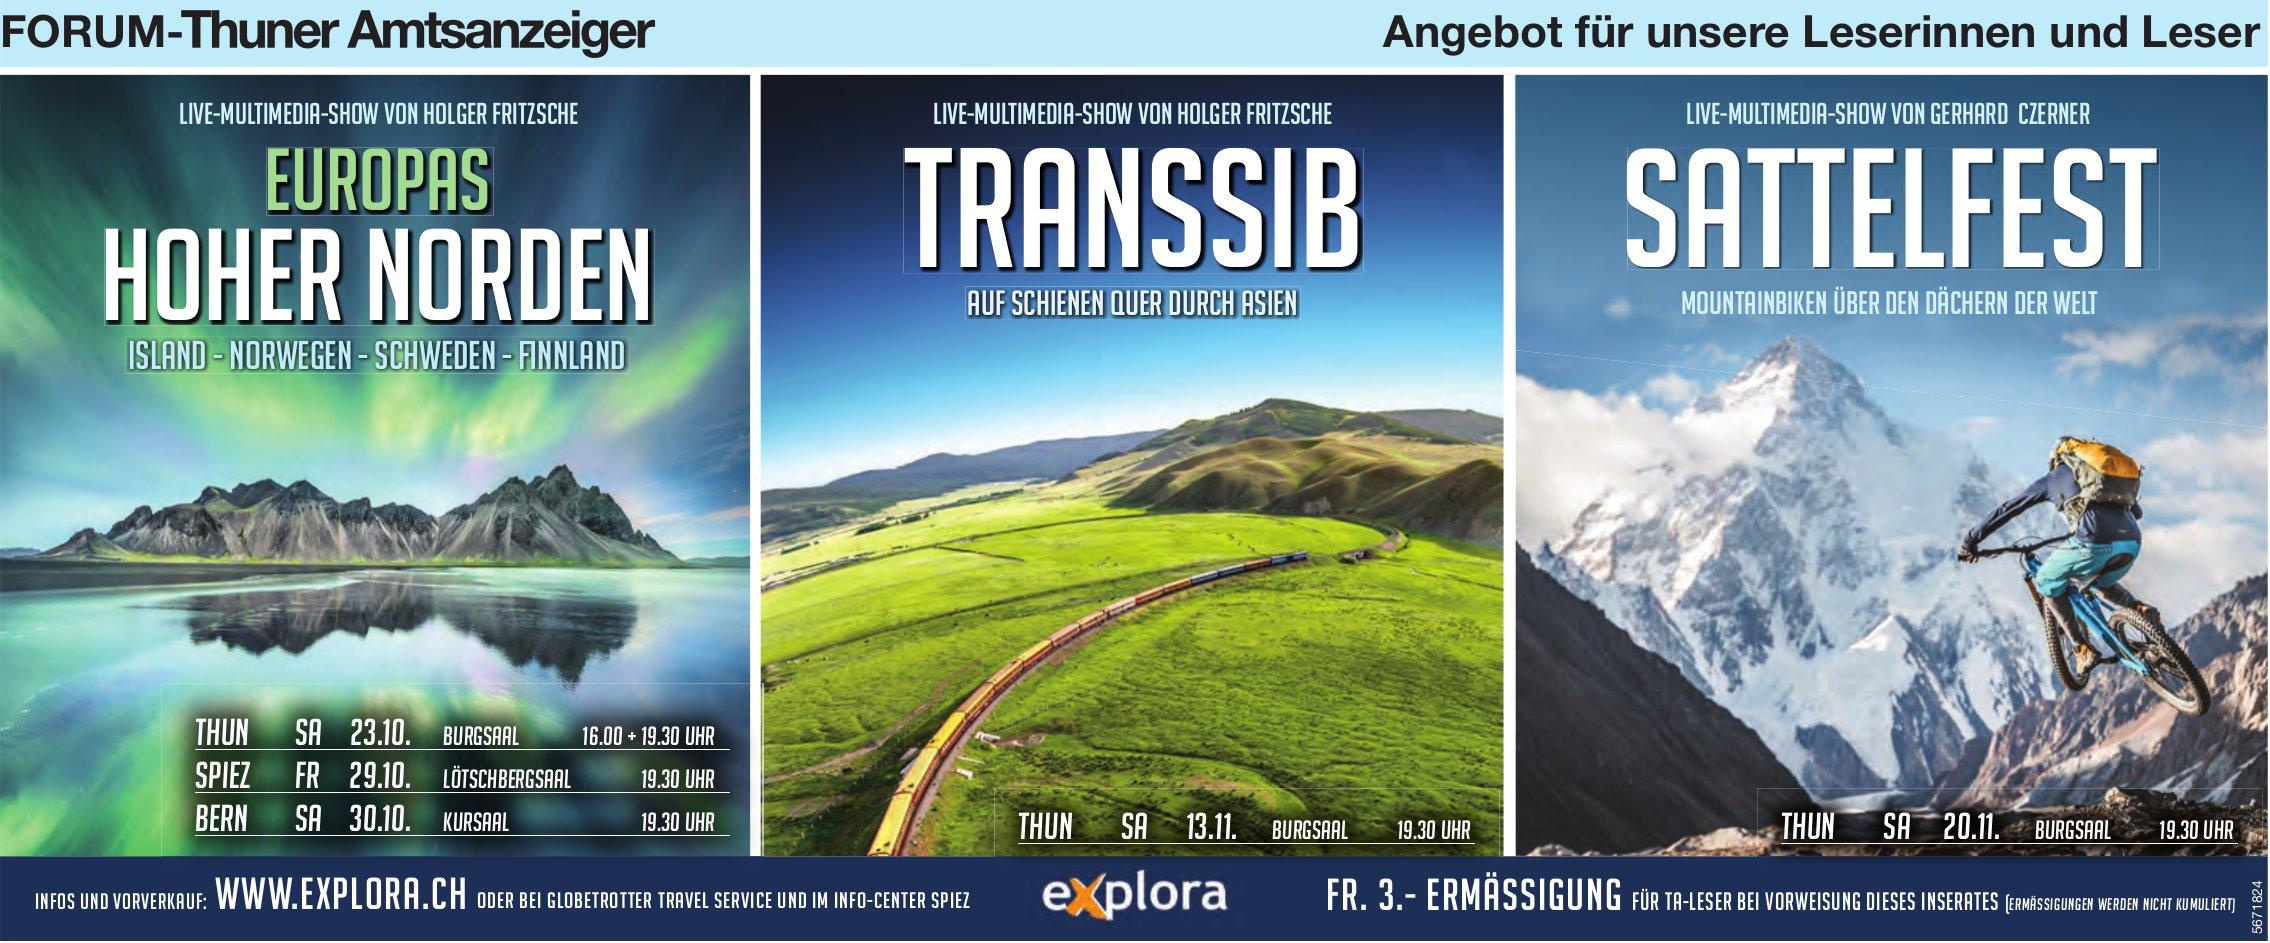 Forum-Thuner Amtsanzeiger - Live-Multimedia-Show: Europas hoher Norden, Transsib, Sattelfest